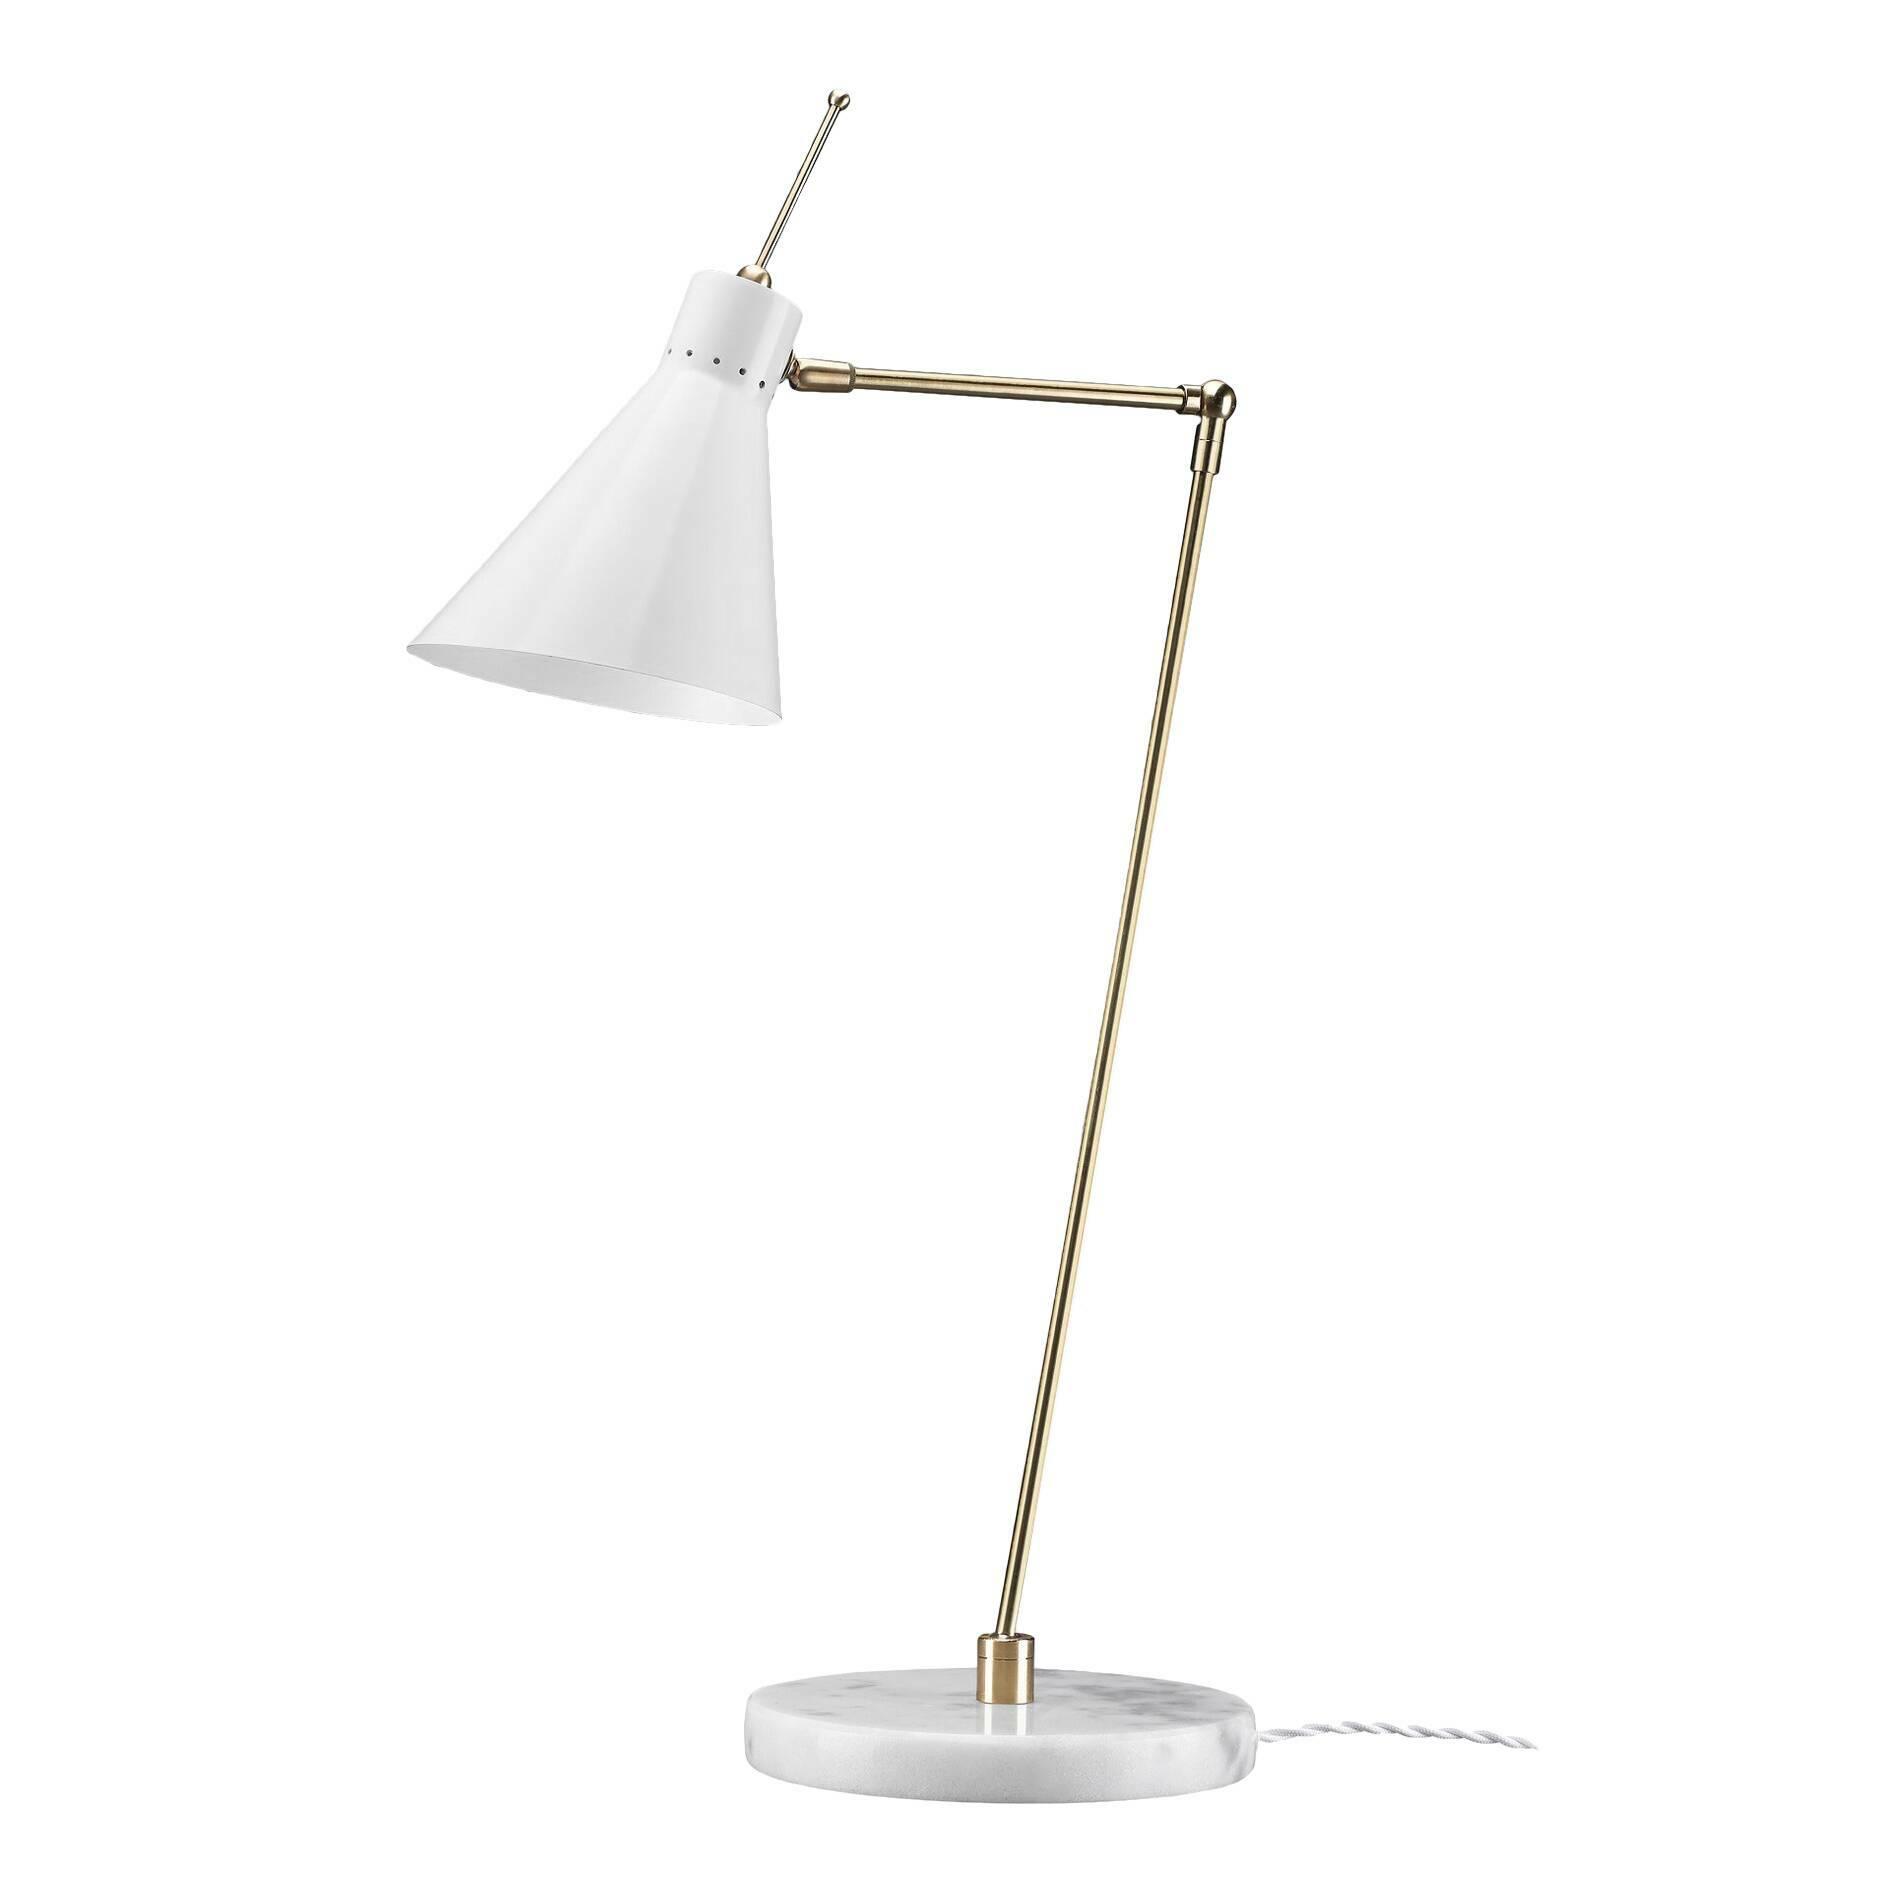 Настольный светильник Vittoriano Vigano